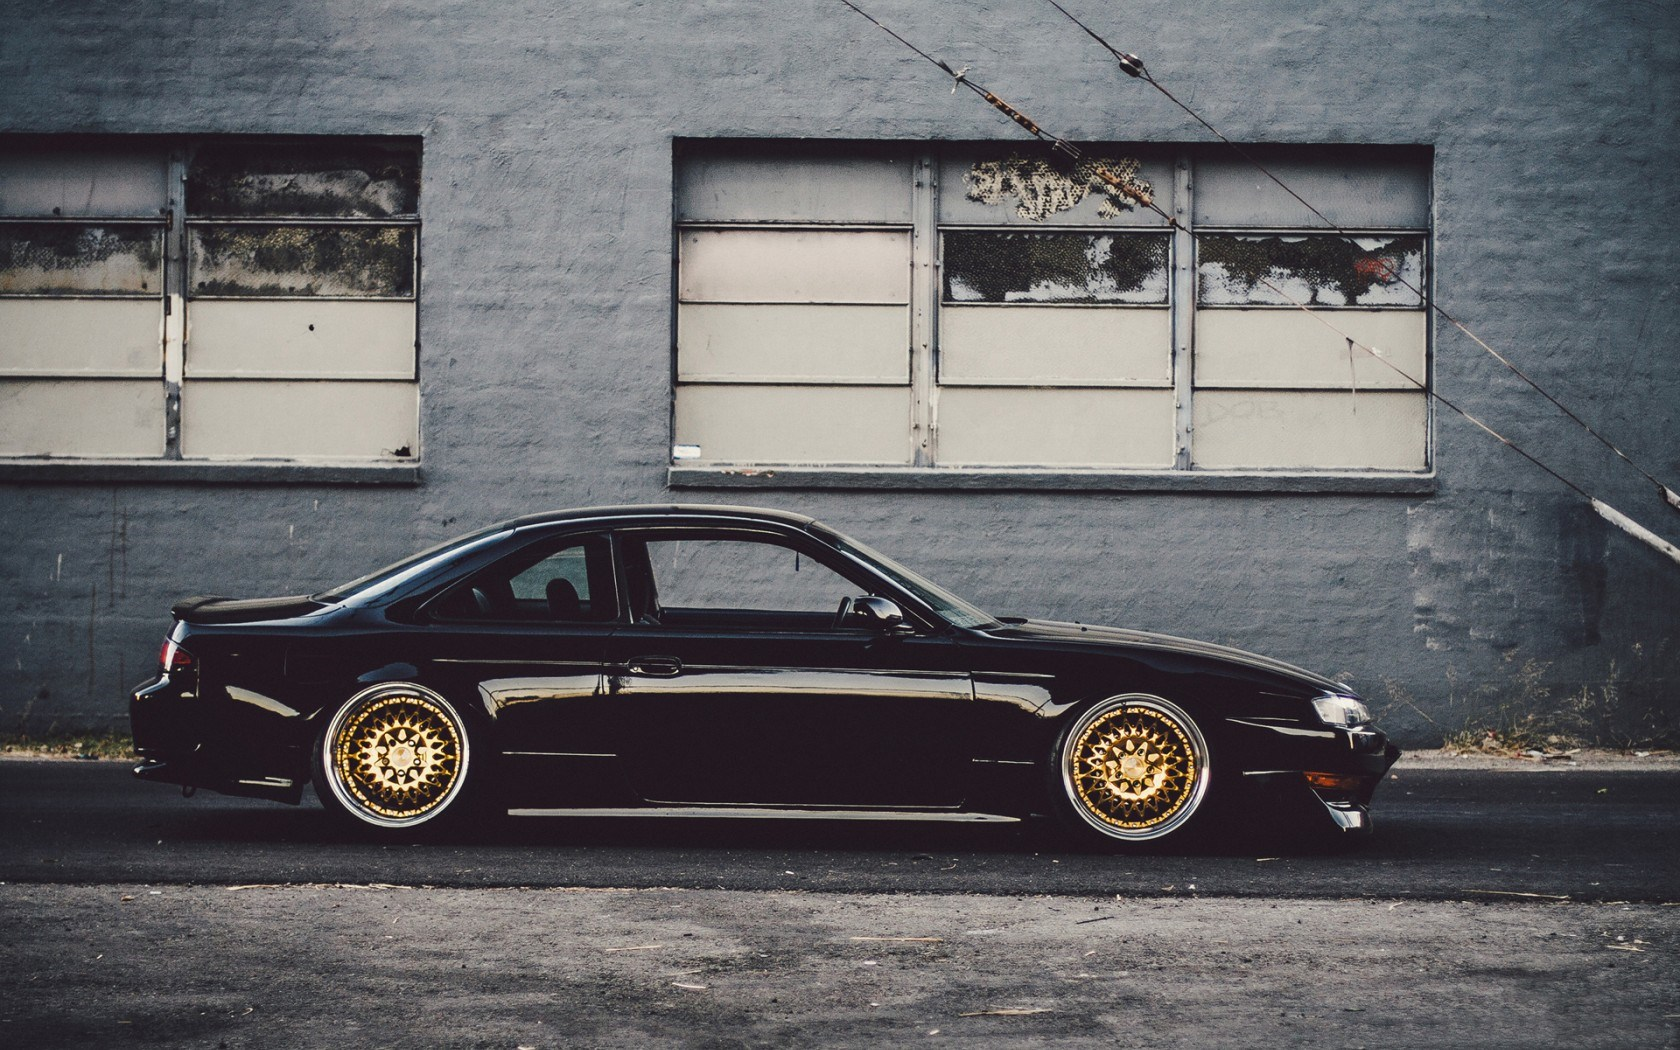 Nissan Silvia 240sx S14 Car Tuning Side Wallpaper 1680x1050 17577